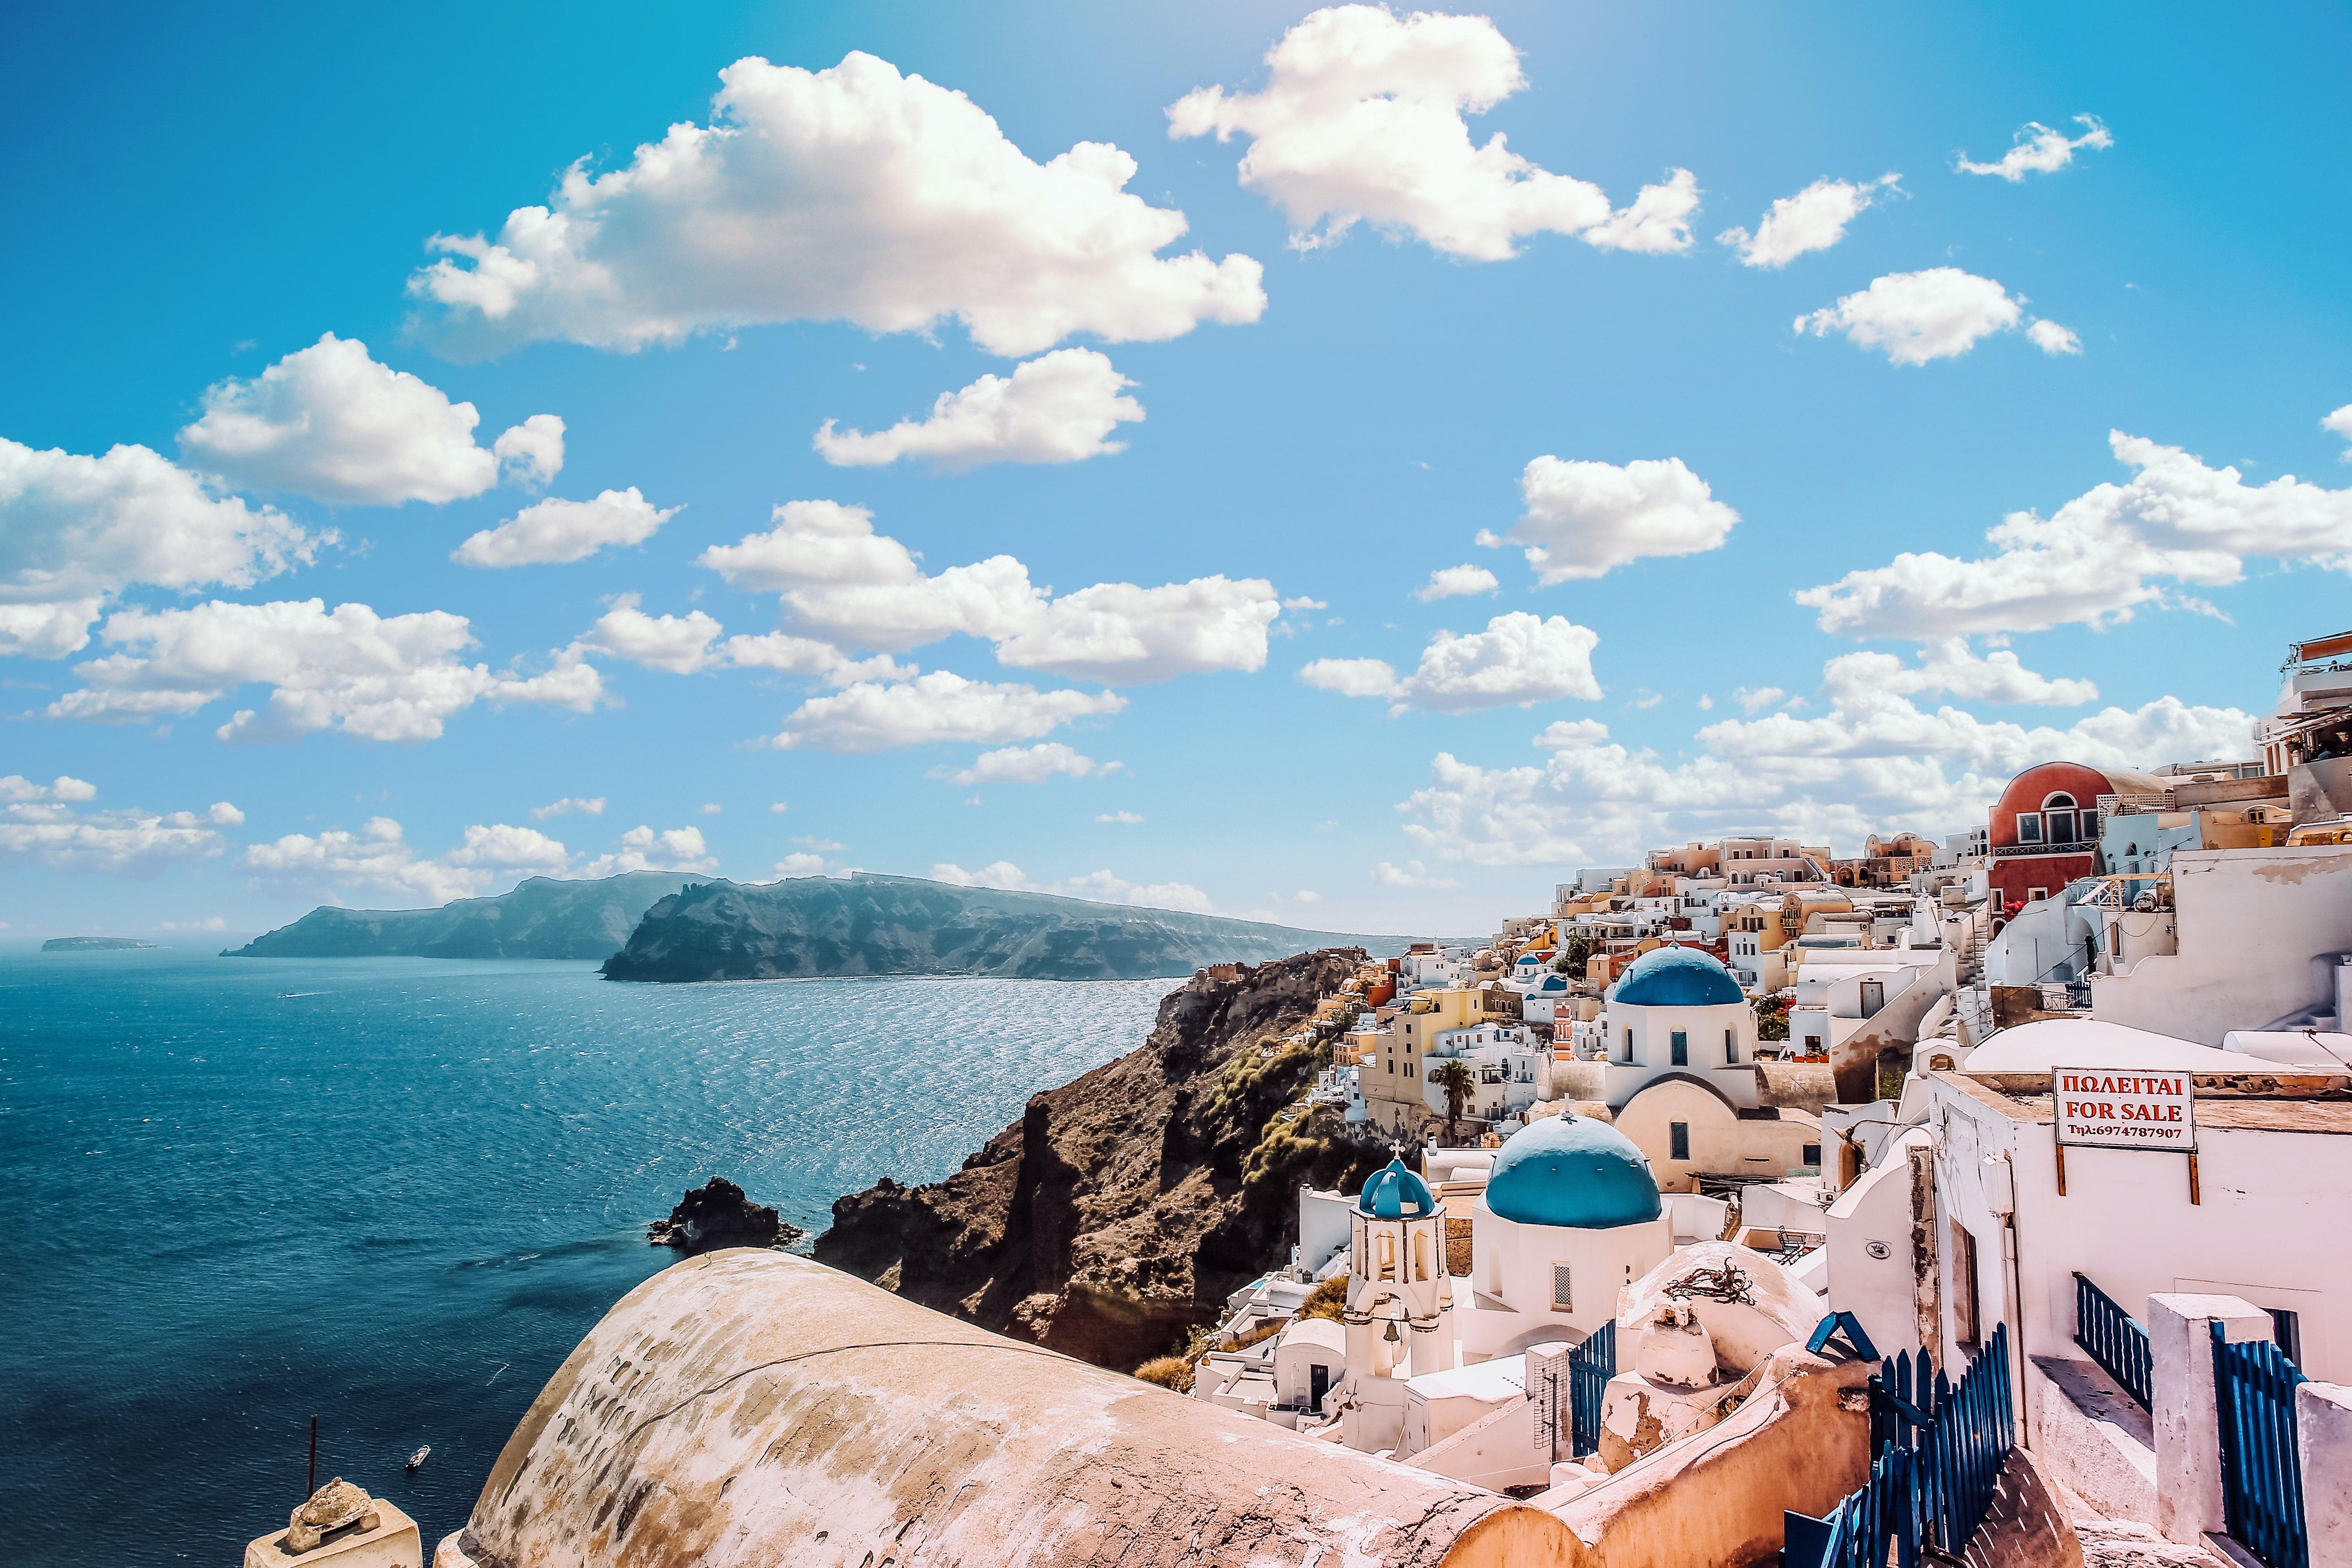 Honeymoon-at-Home Date Night, Destination: Santorini, Greece